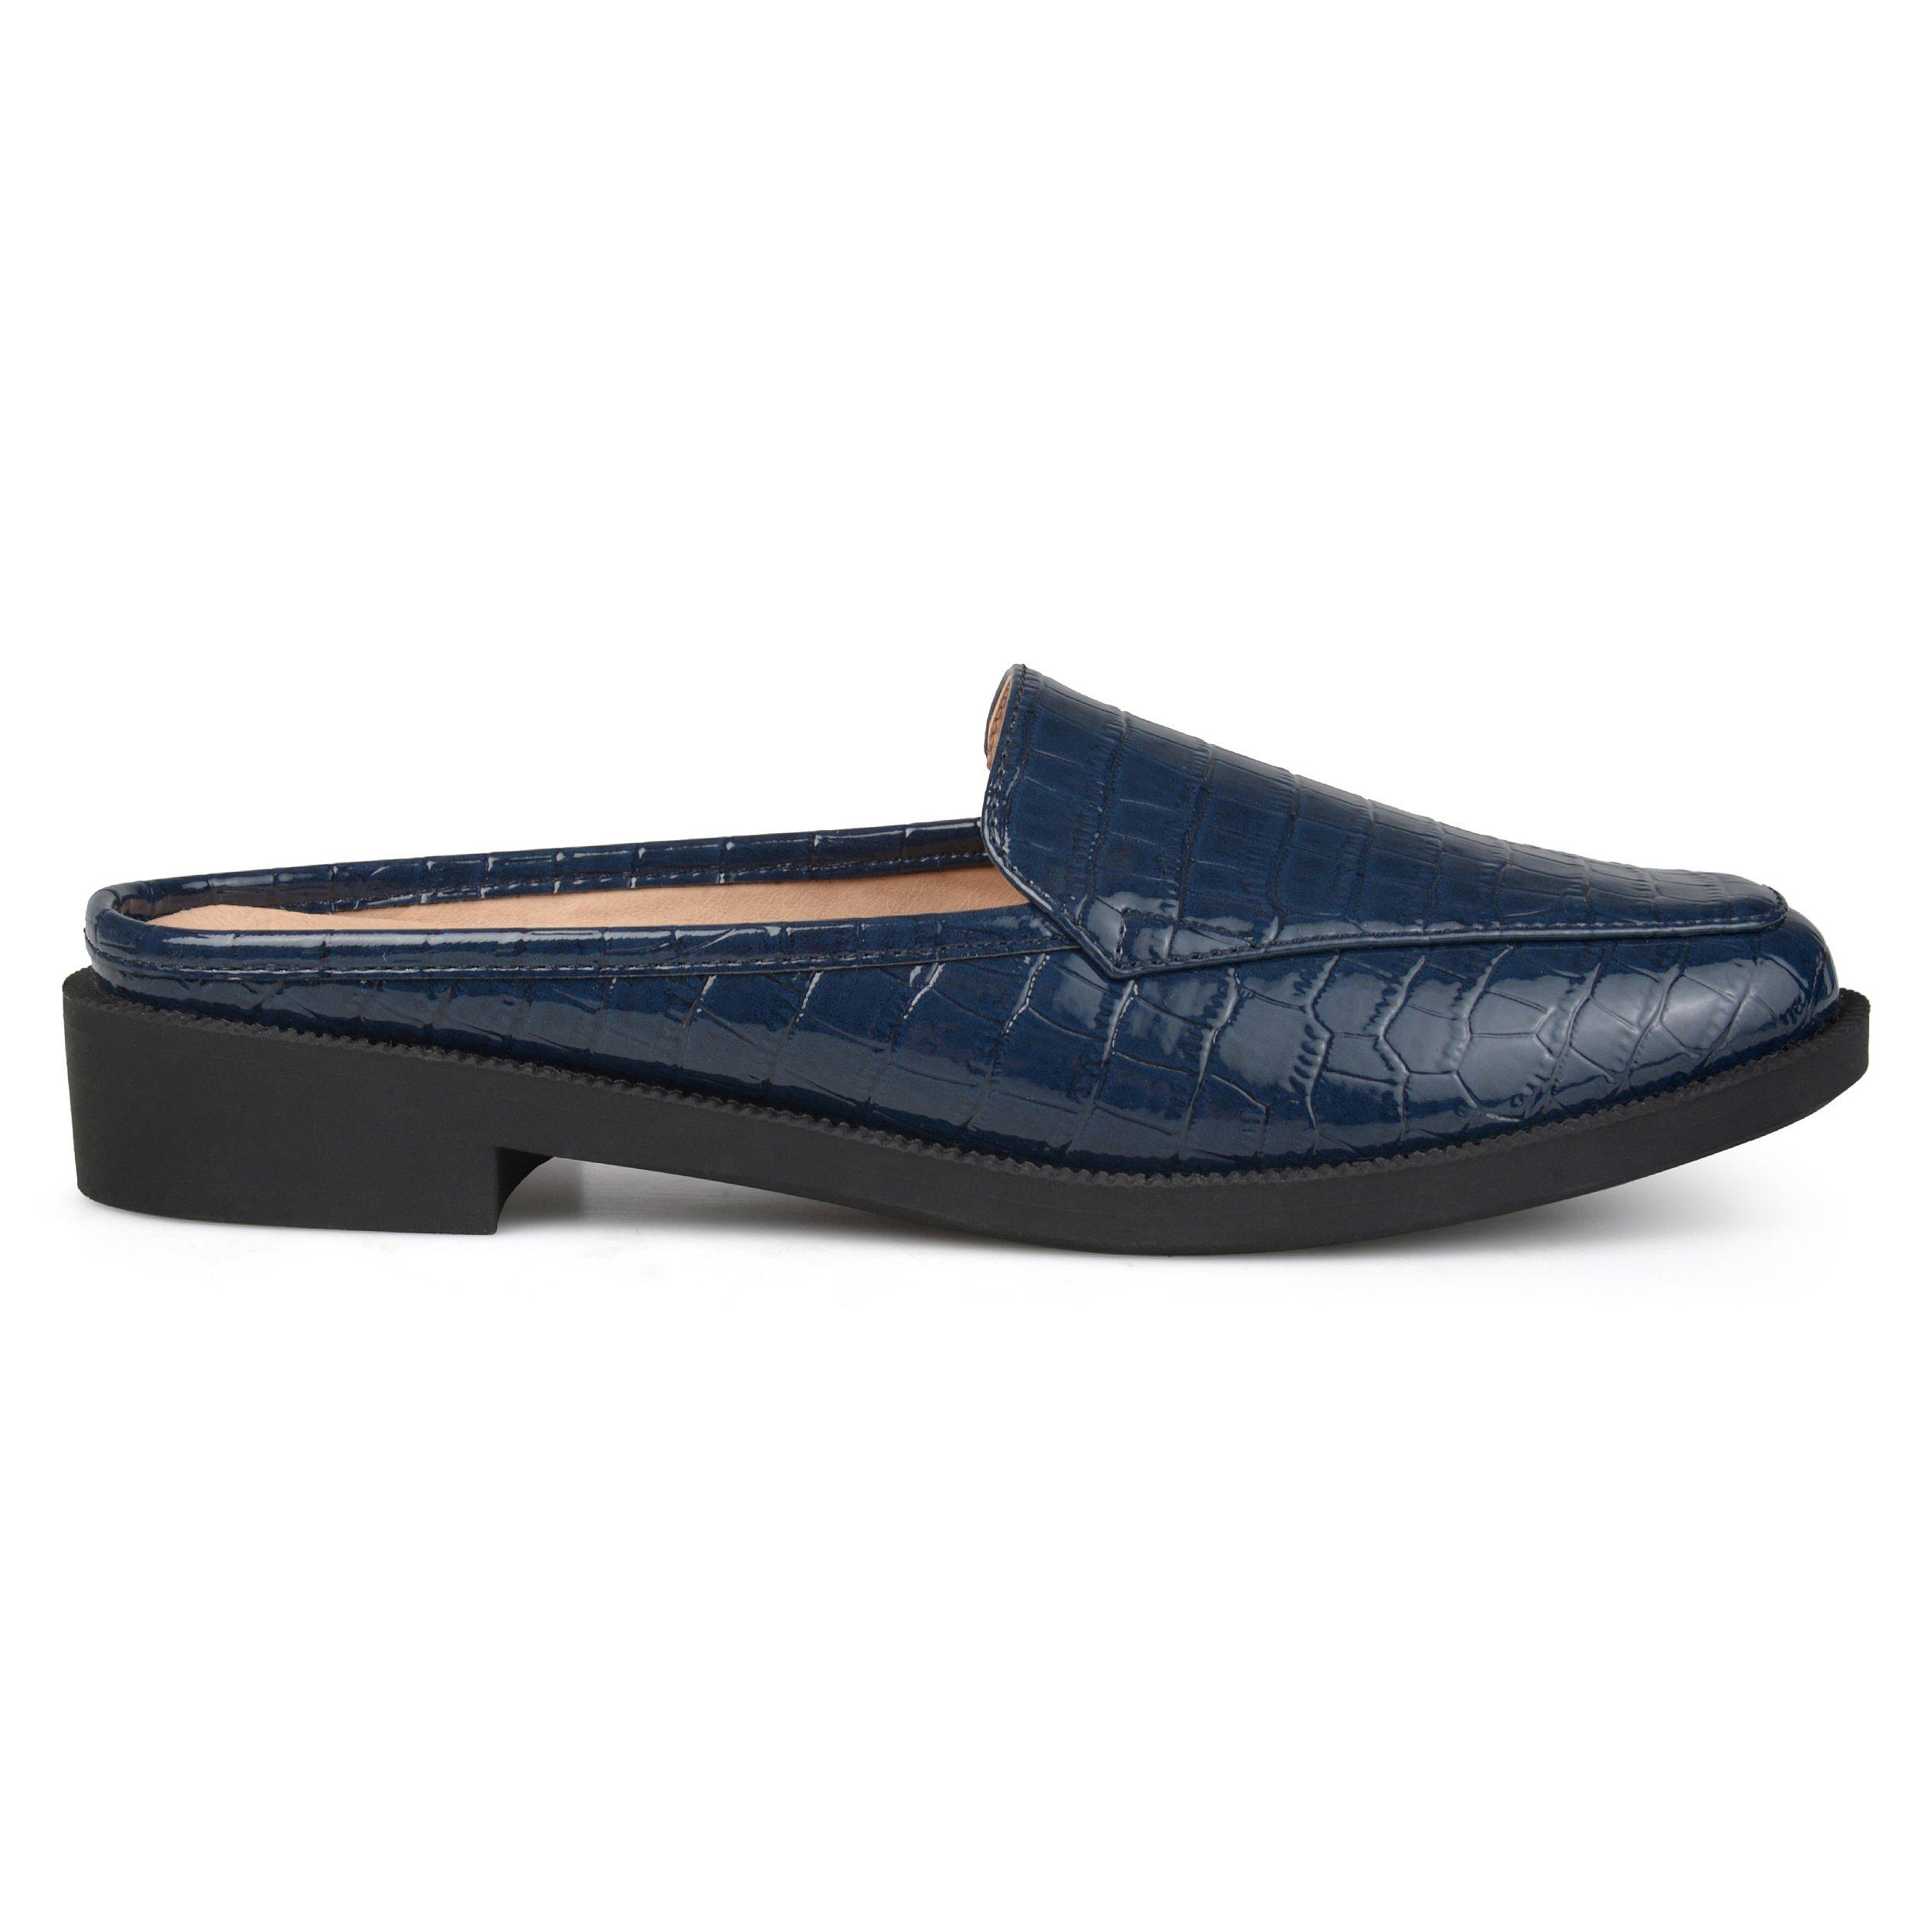 Brinley Co. Womens Jem Faux Patent Square Toe Comfort-Sole Croc Pattern Slide Mules